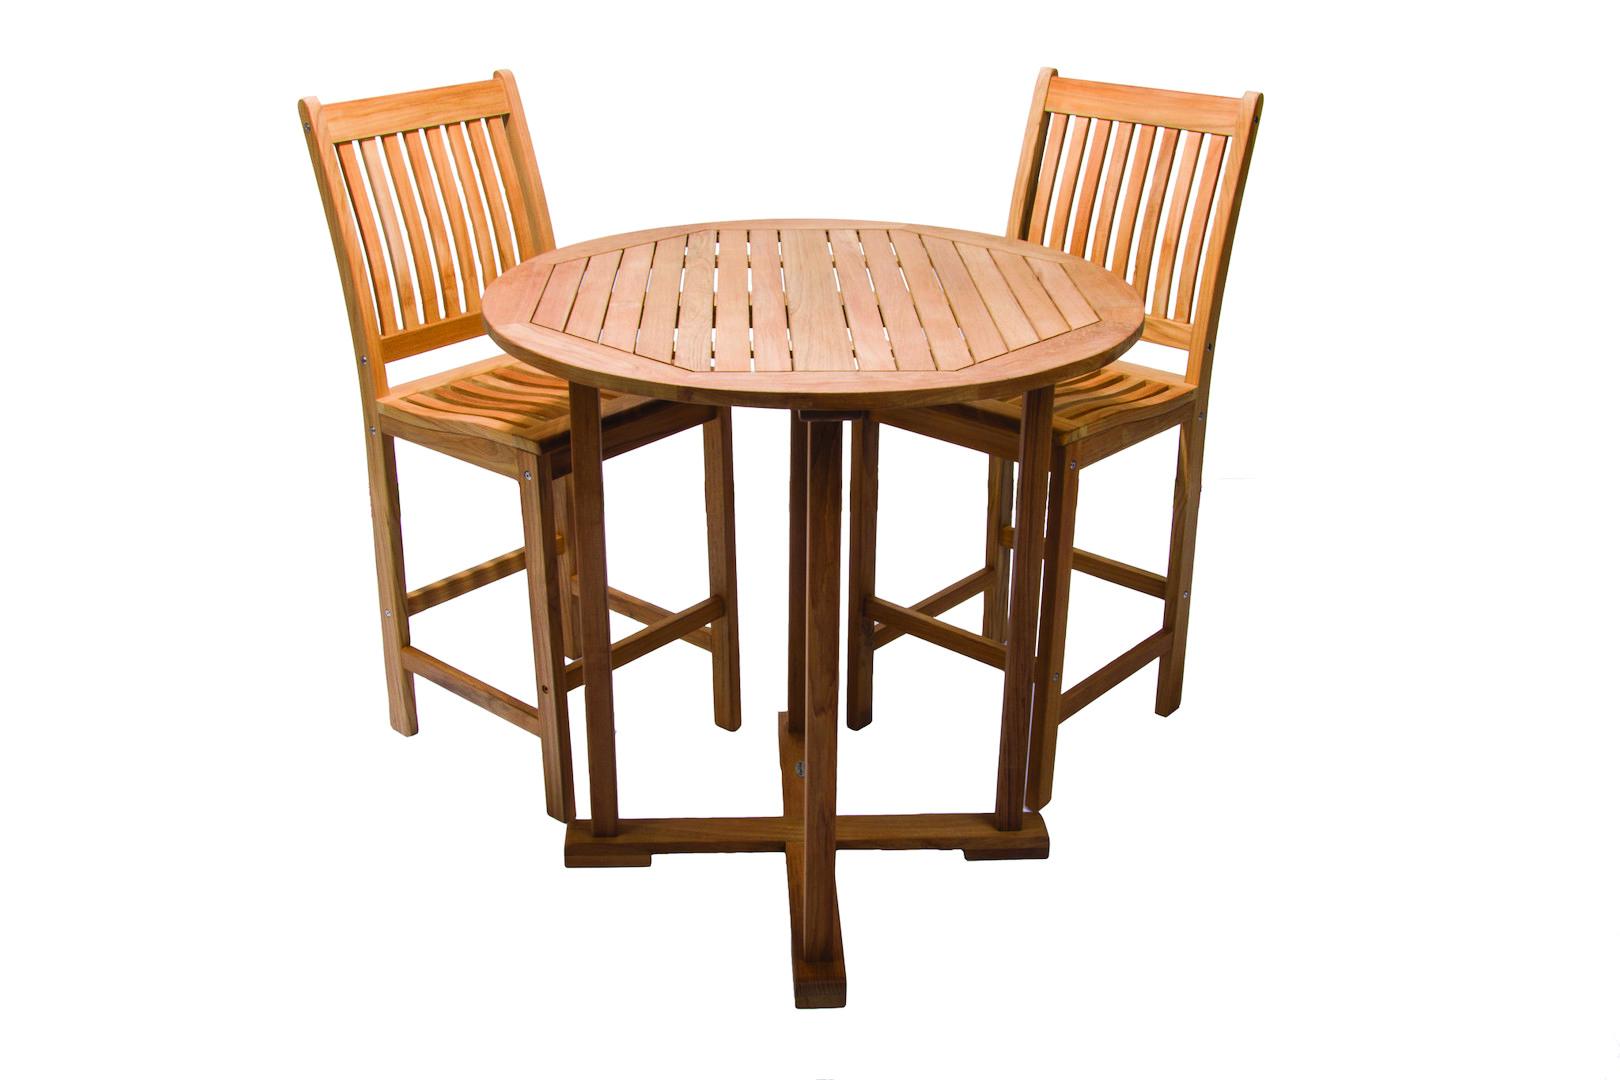 Teak Bar Chair by Royal Teak Collection - BARC - Outdoor Teak & More